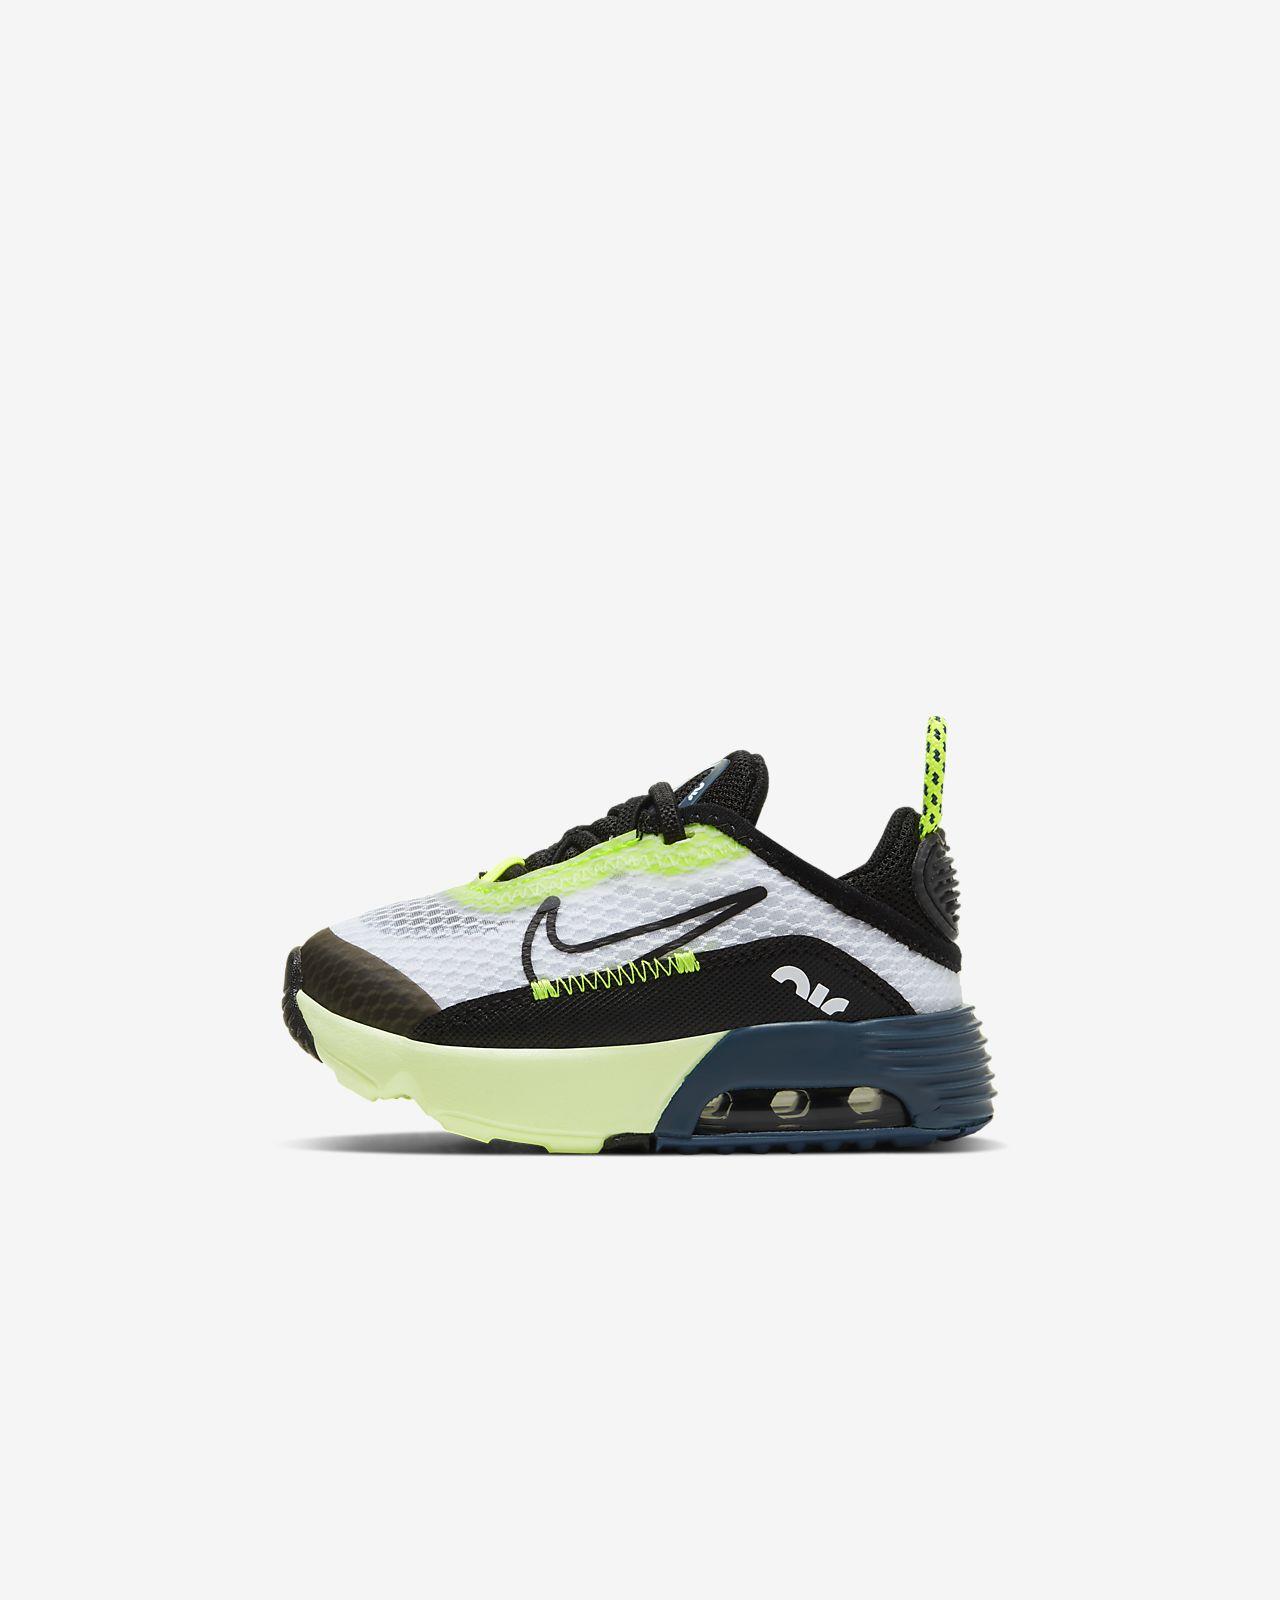 Nike Air Max 2090-sko til babyer/småbørn